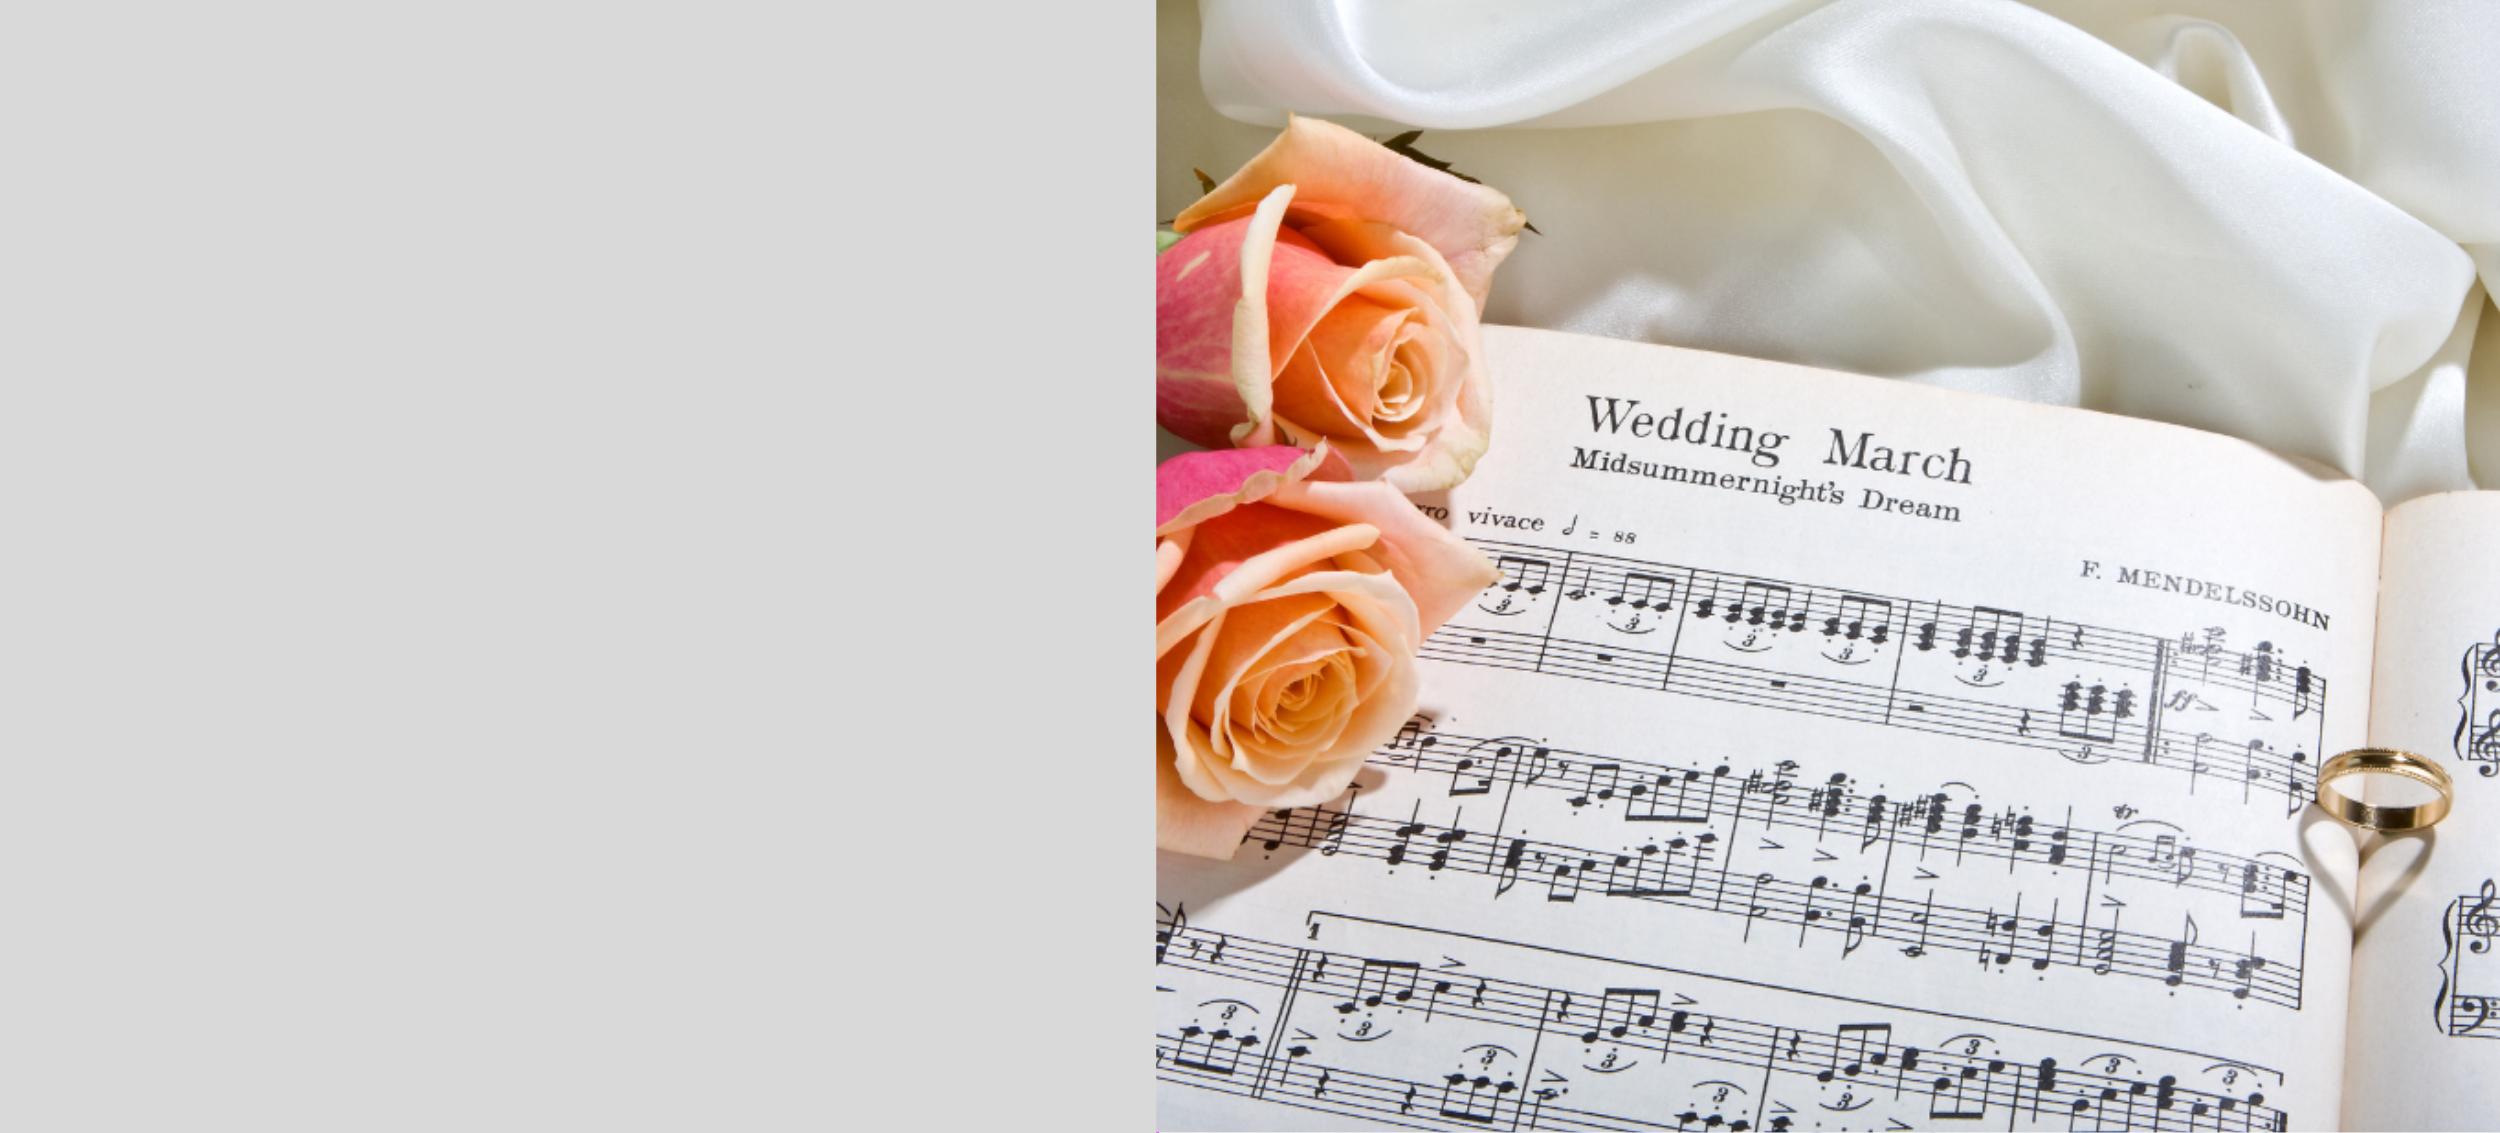 Choosingyourweddingmusic -